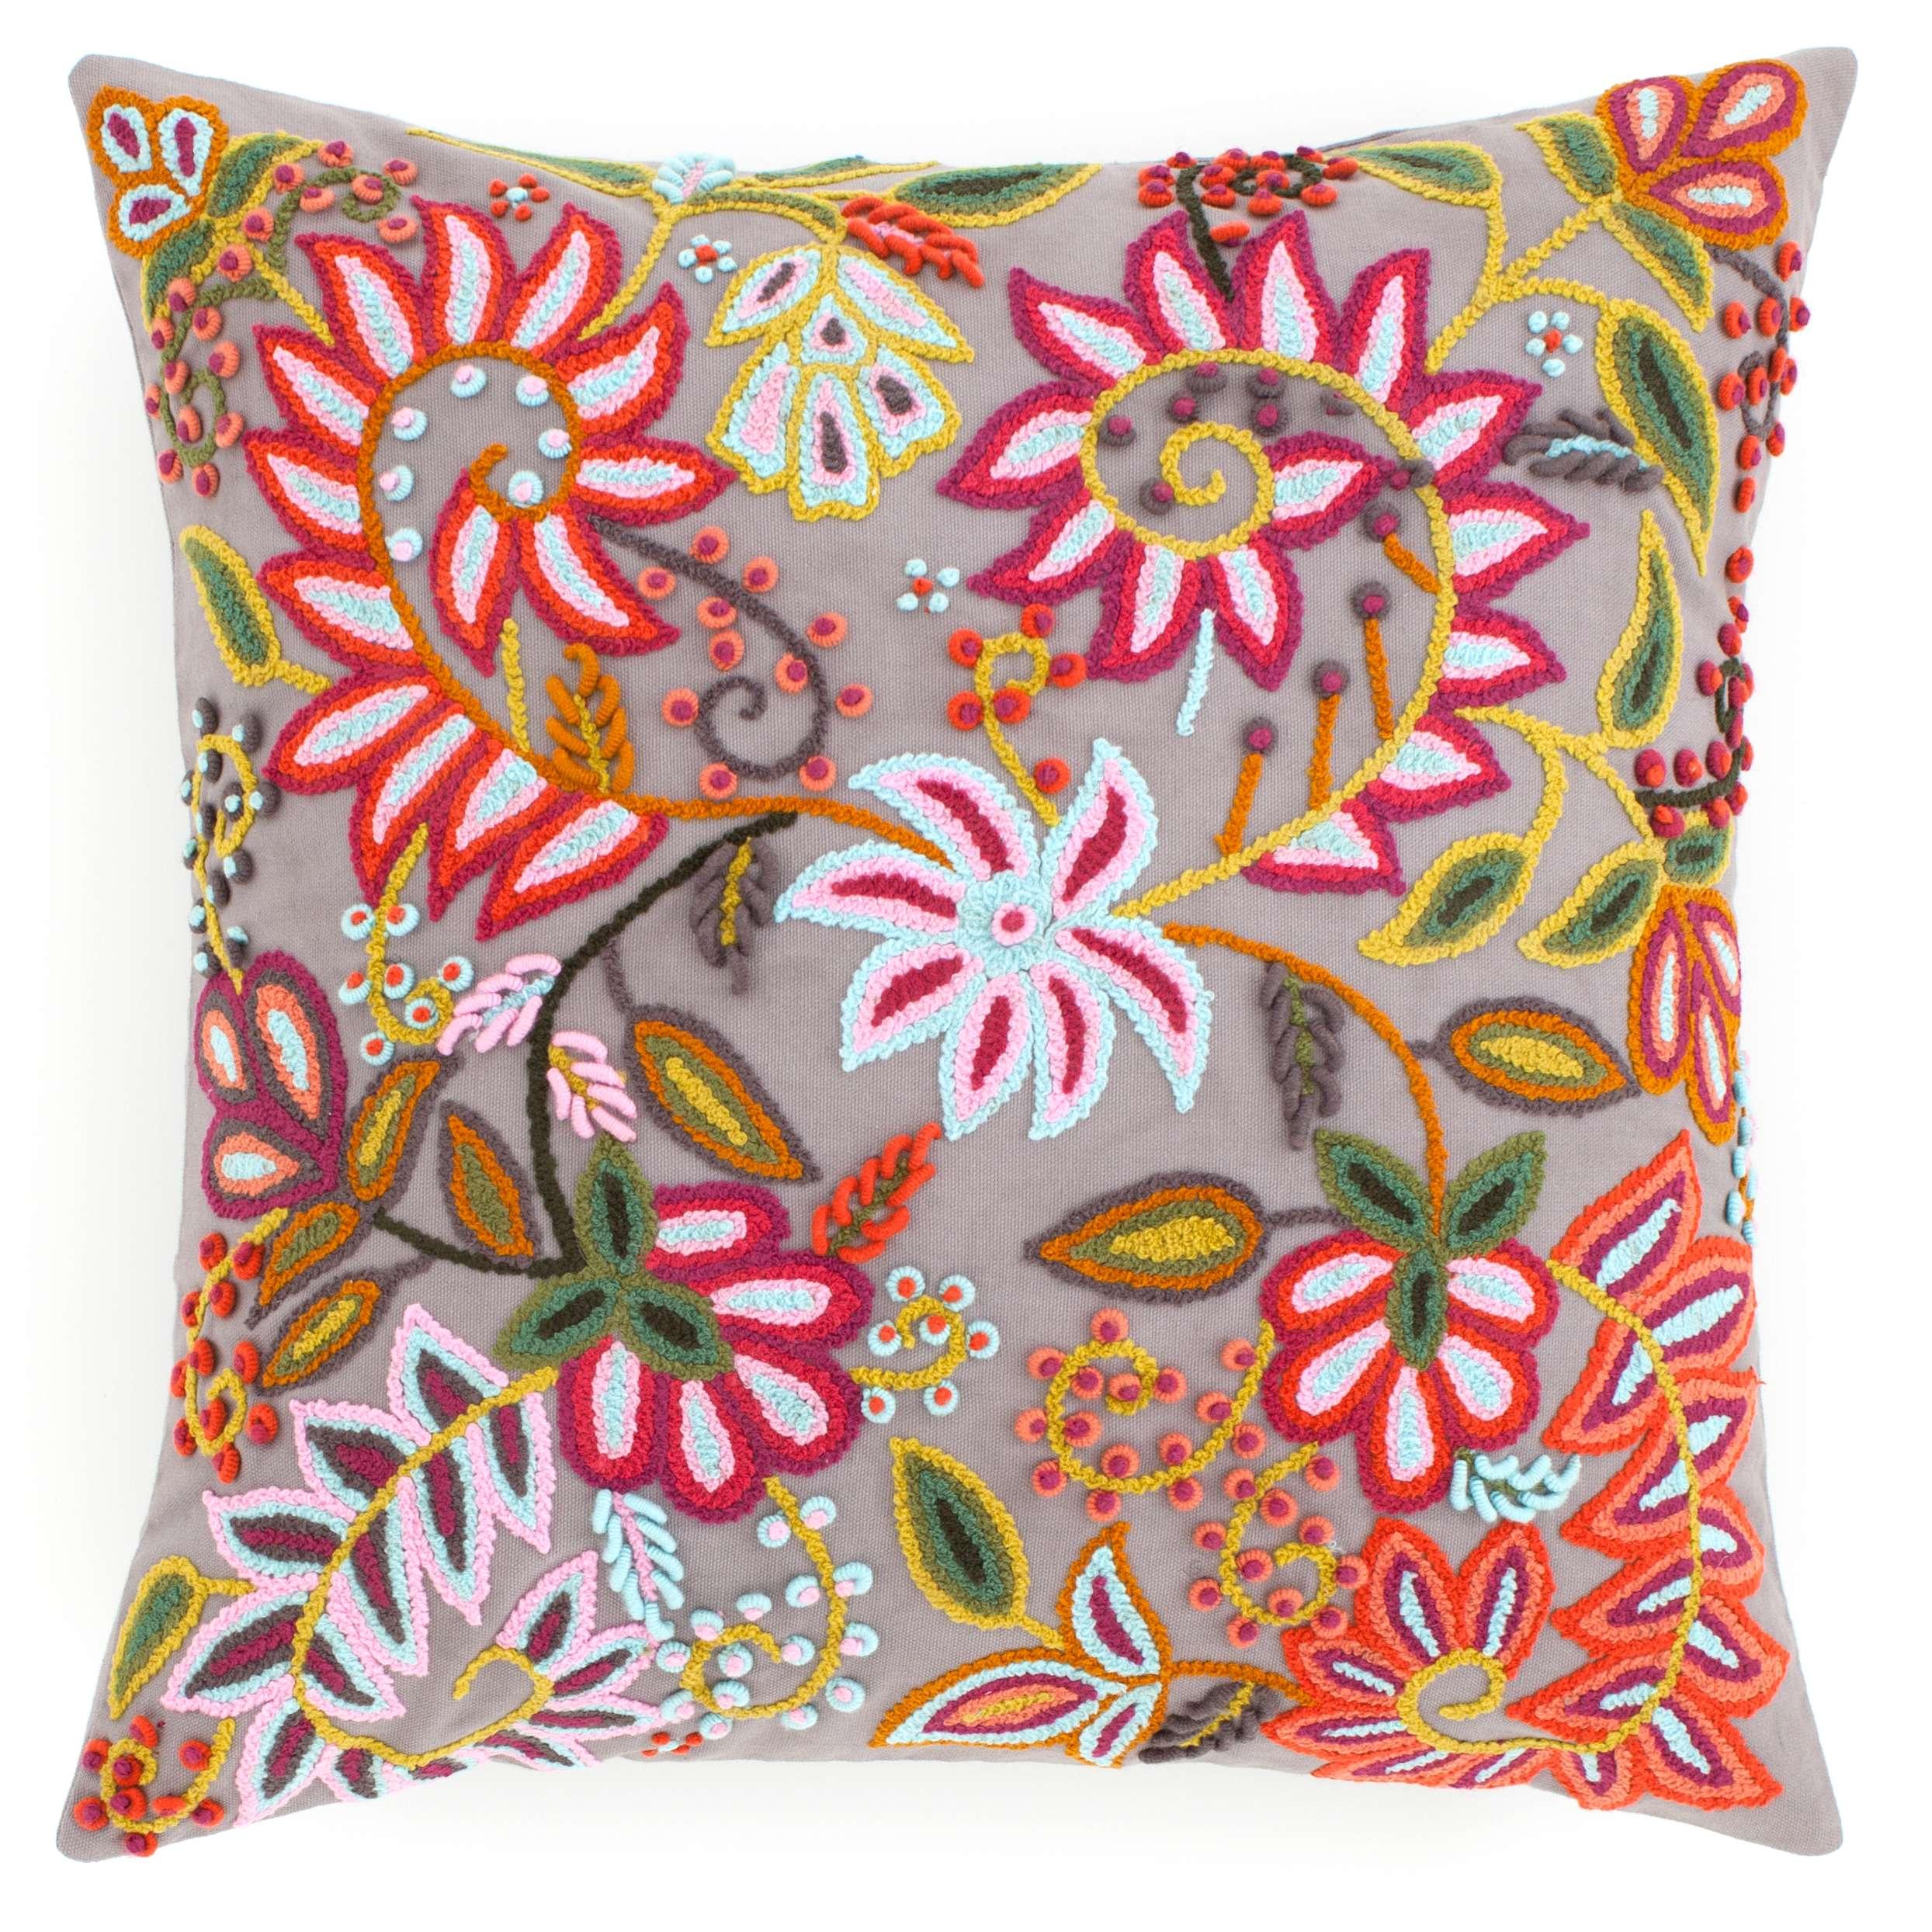 Decorative Pillows Outlet : Lima Grey Decorative Pillow The Outlet